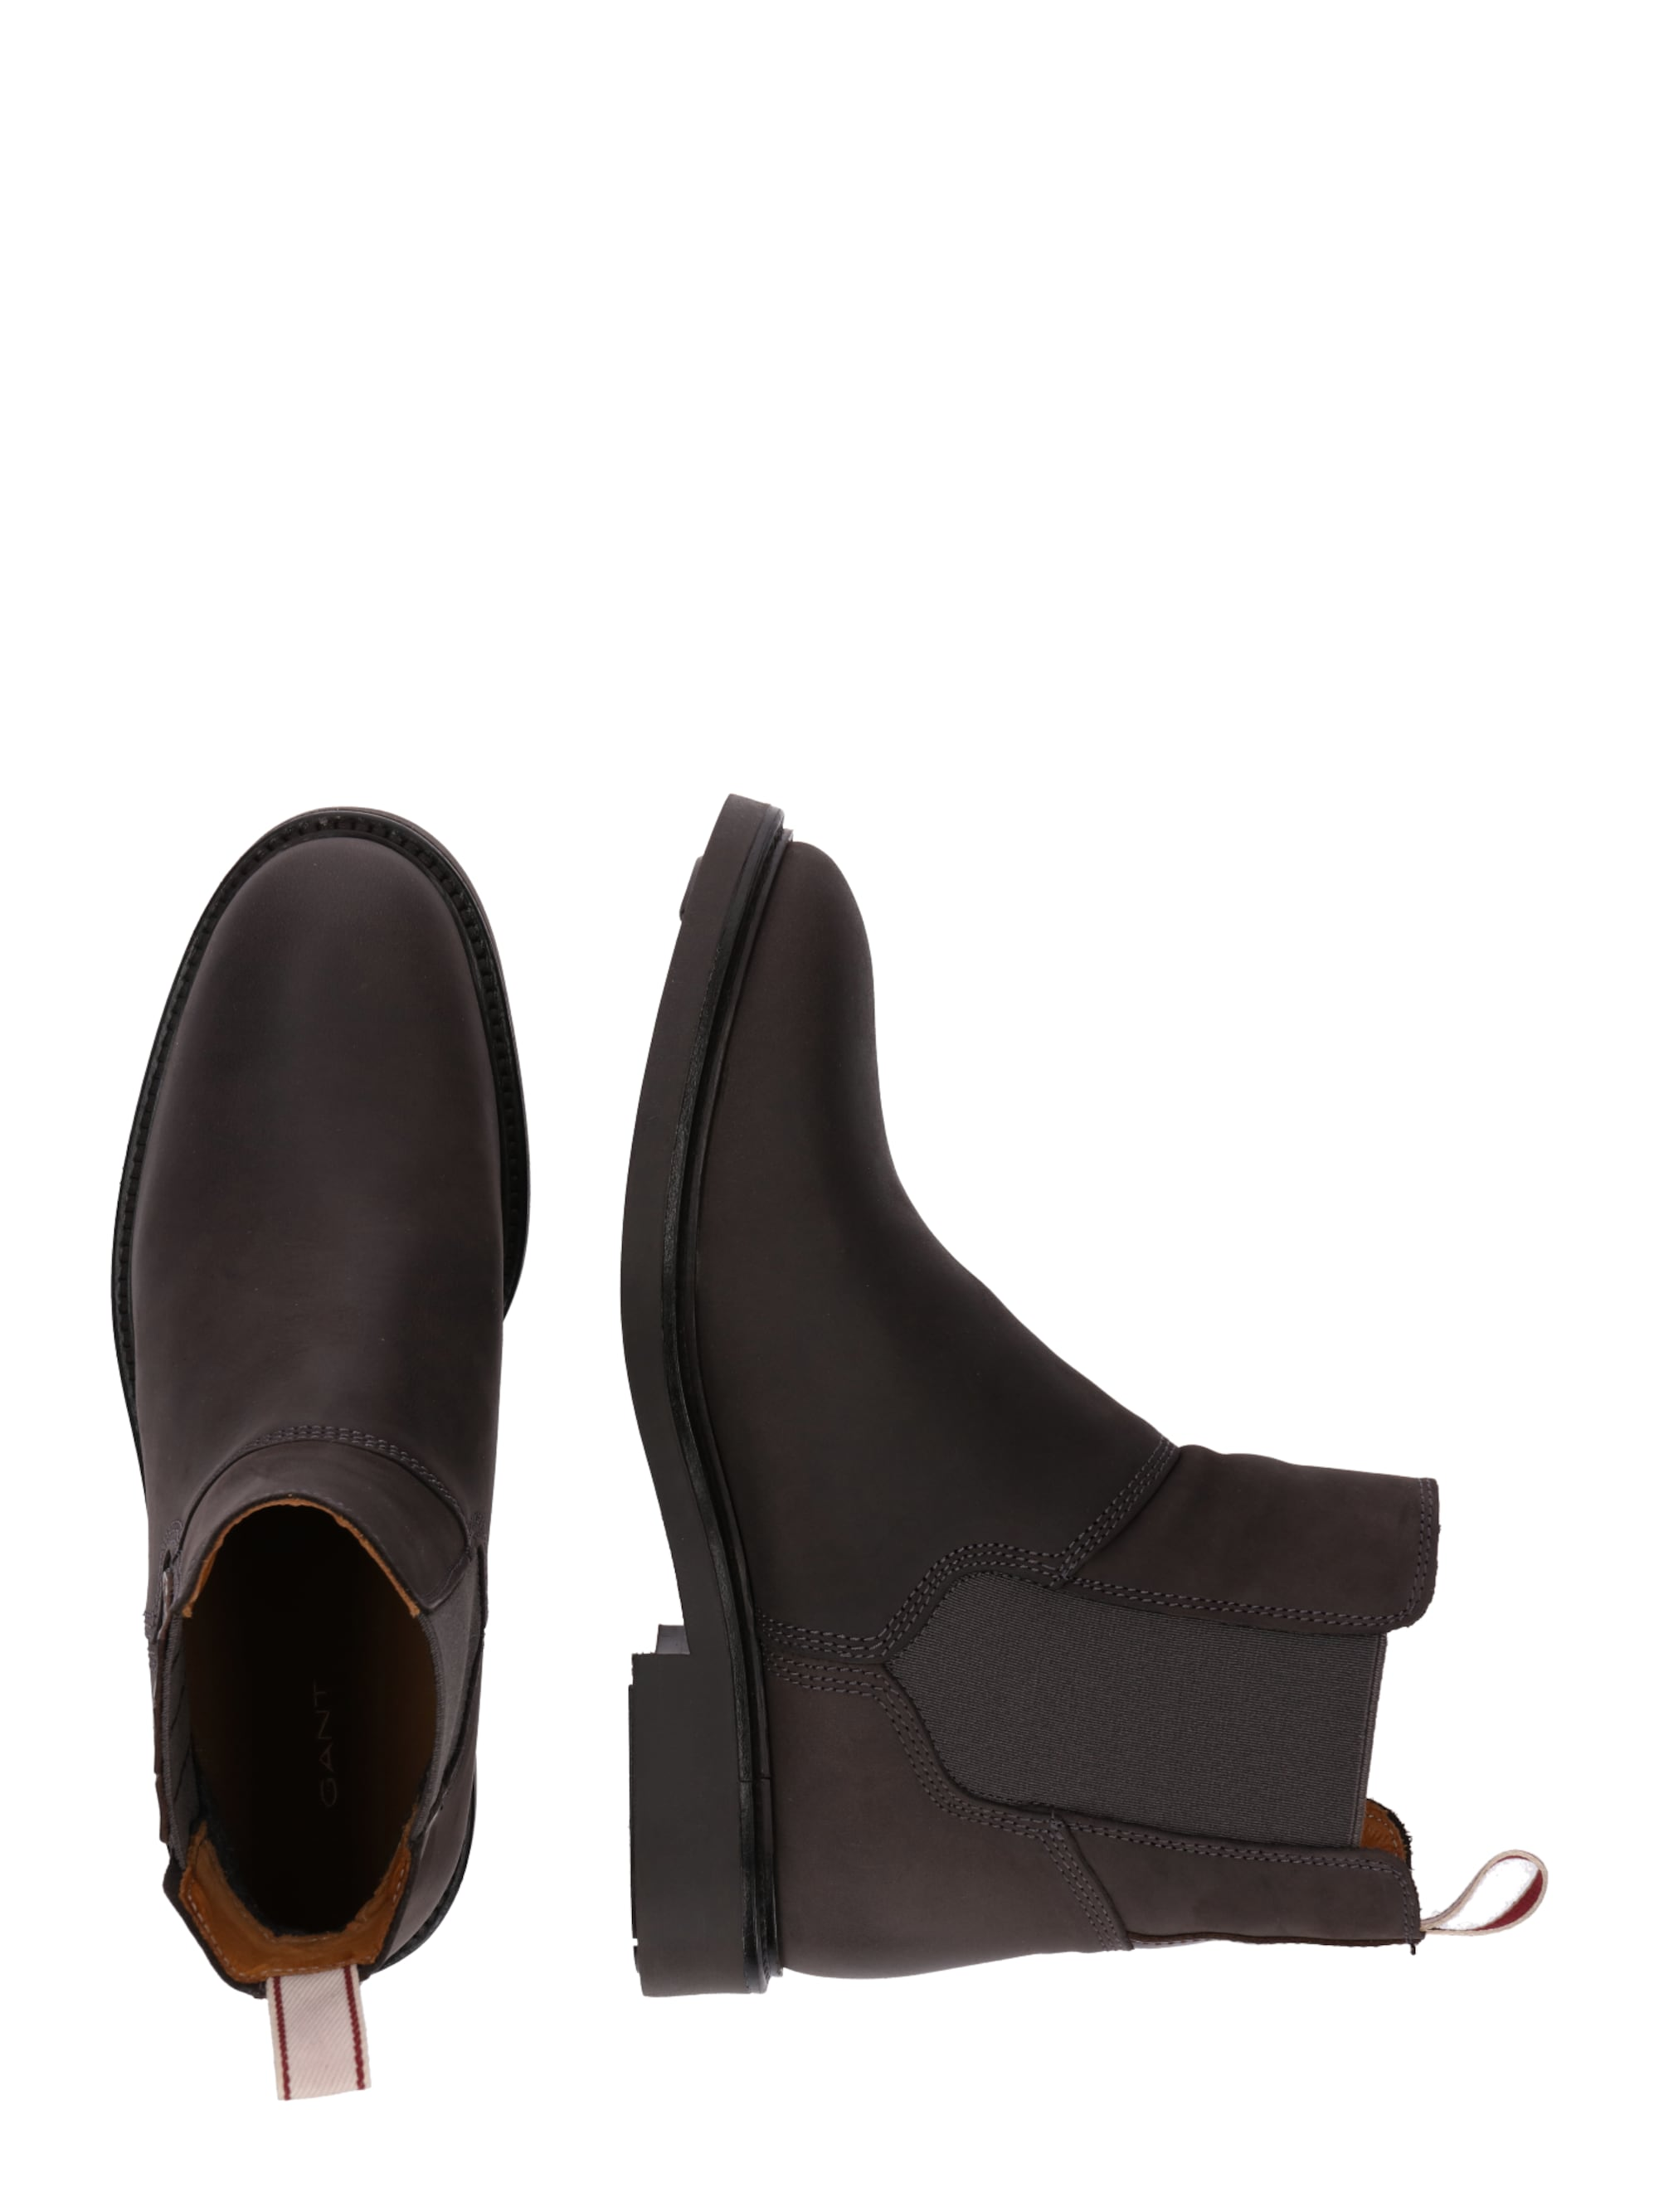 Chelsea boots 'Ashley'